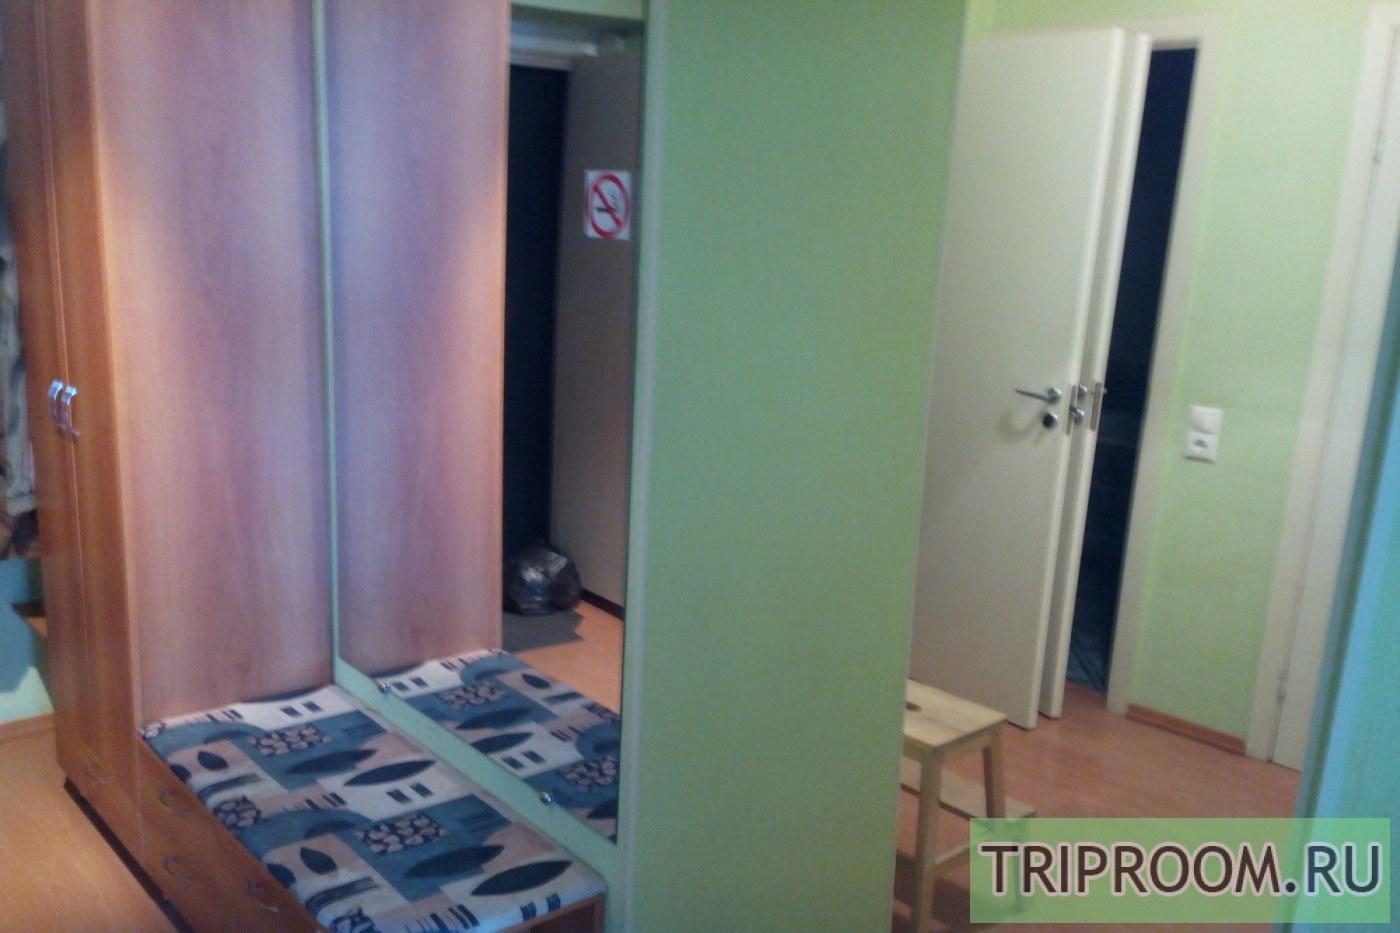 3-комнатная квартира посуточно (вариант № 40613), ул. Фрунзе улица, фото № 10